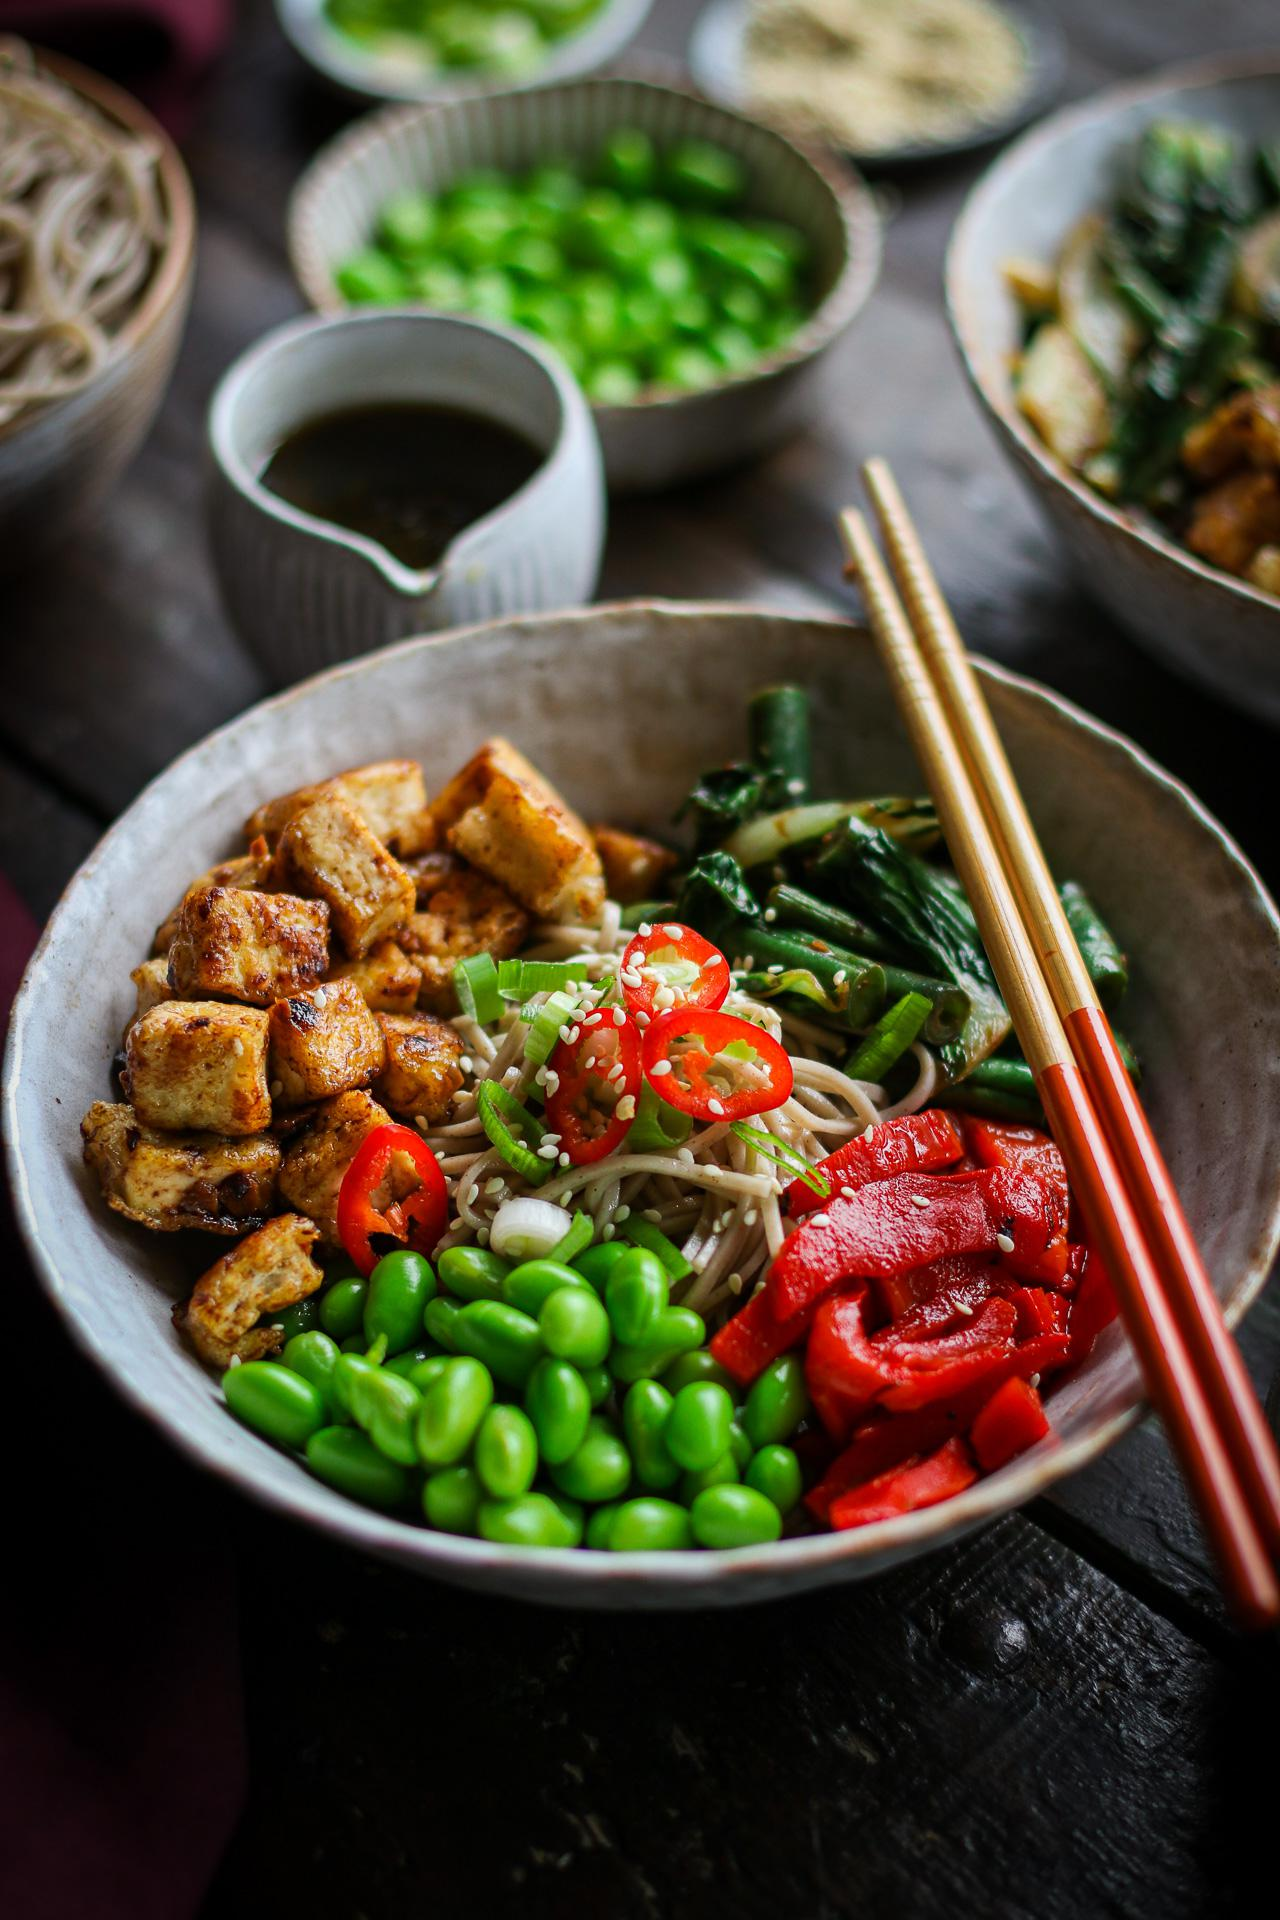 Main image of Black Bean Garlic Tofu Nourish Bowl